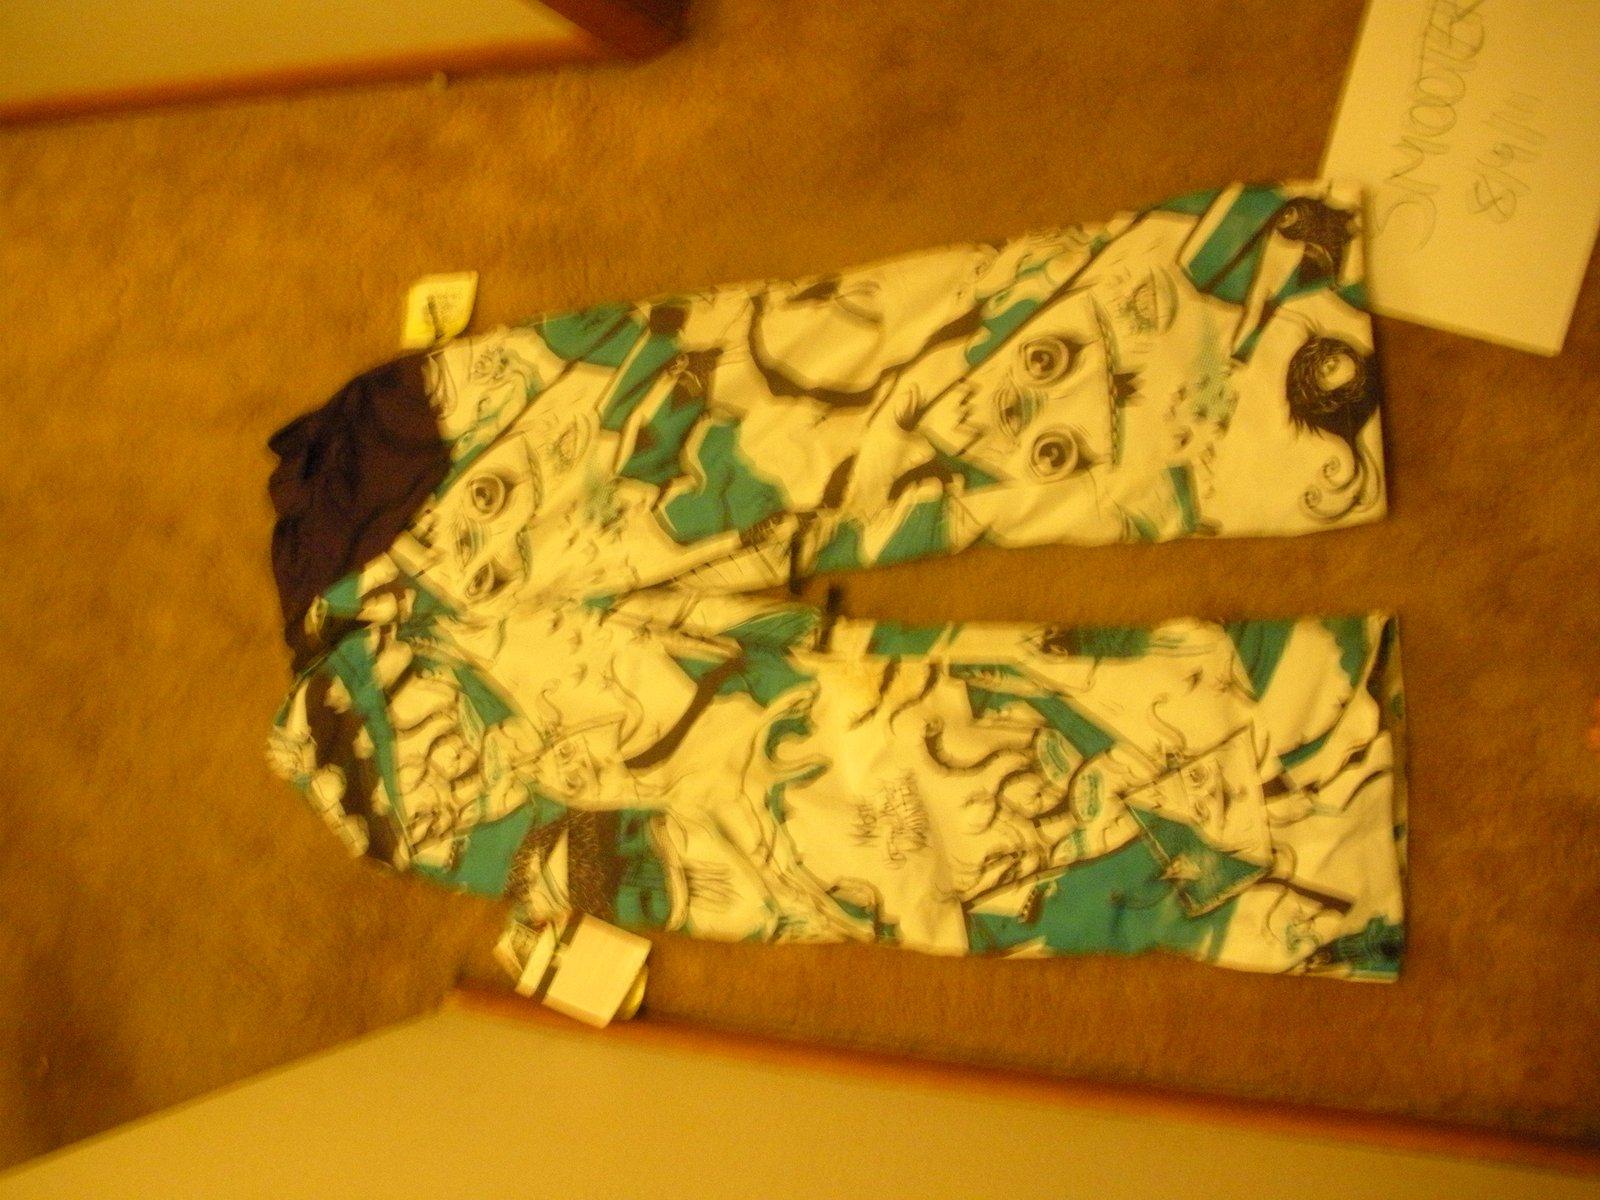 Magis pants for thread